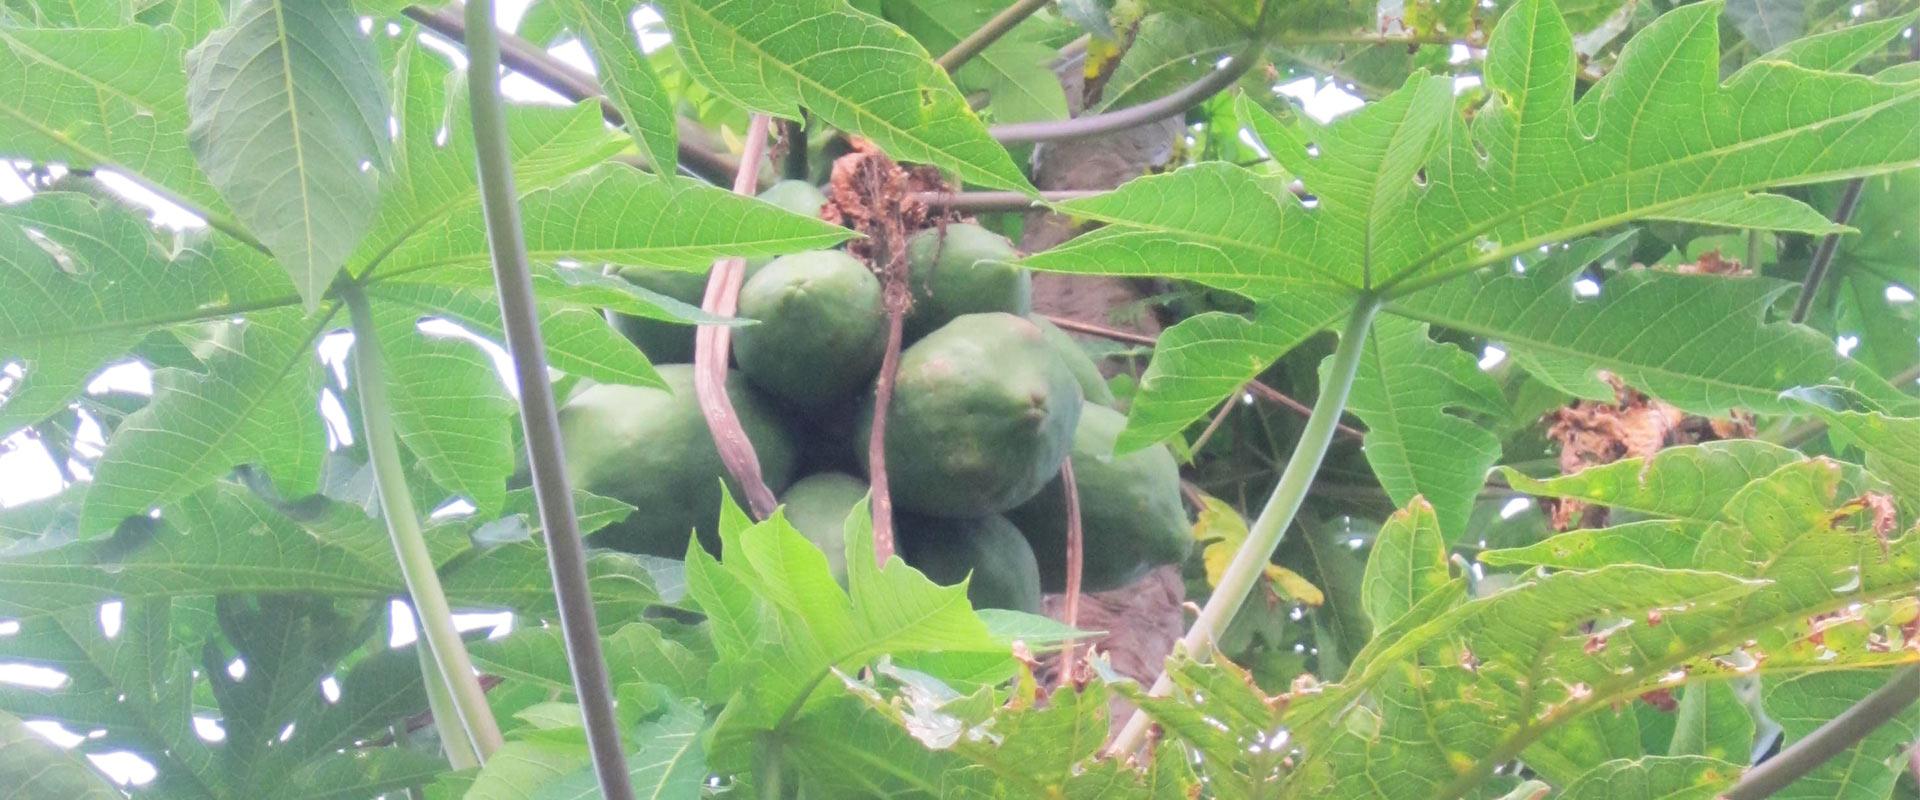 fspn-etiopia-alimentacion-cultivos